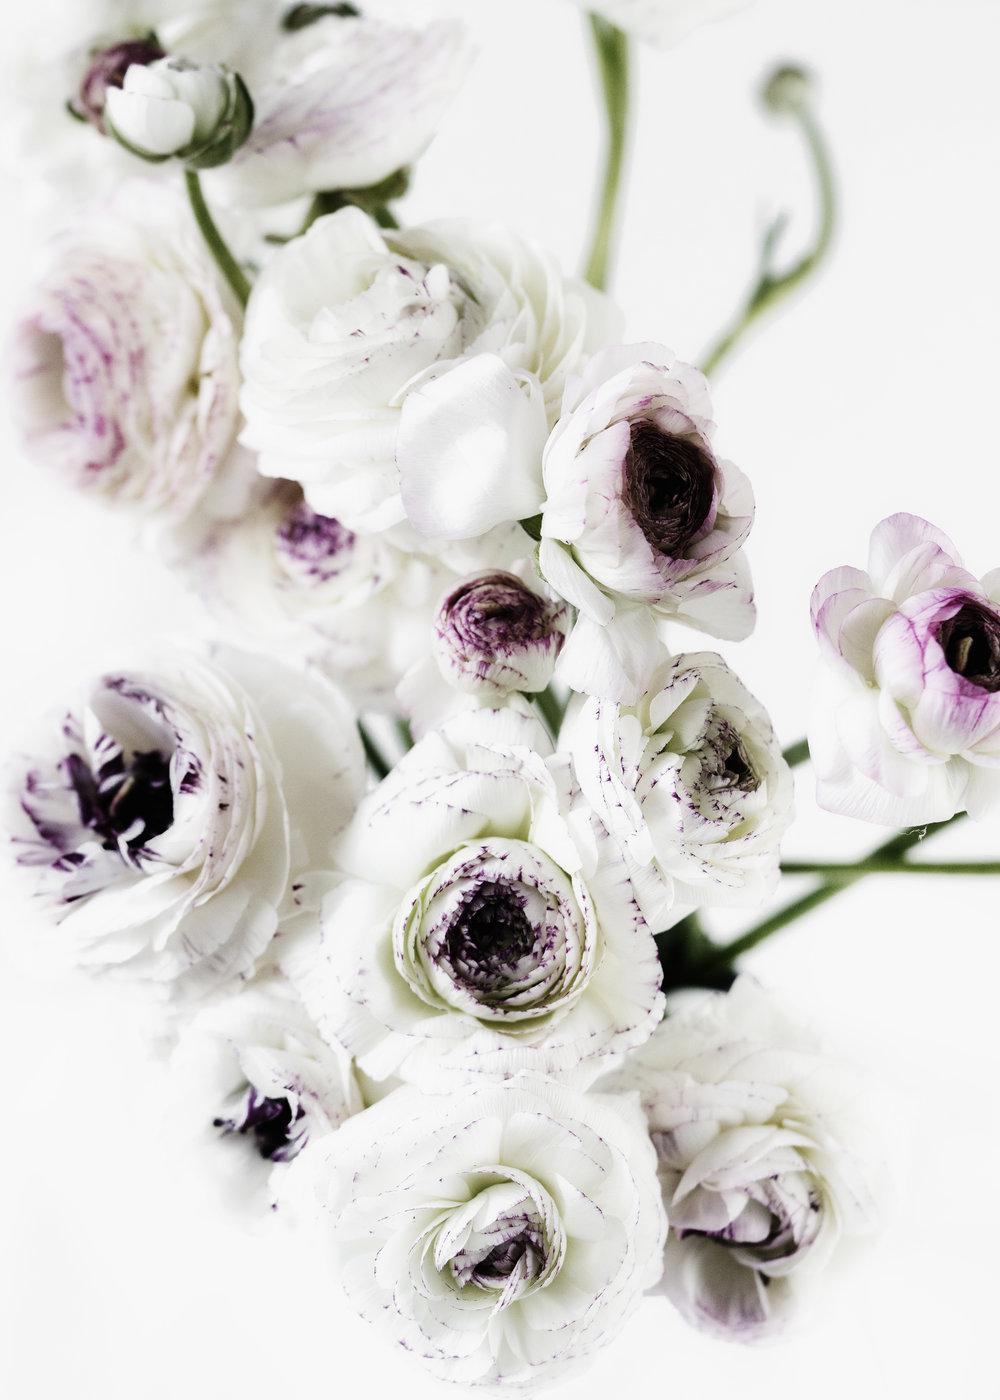 ranunculus light floral art_DSC0698.jpg